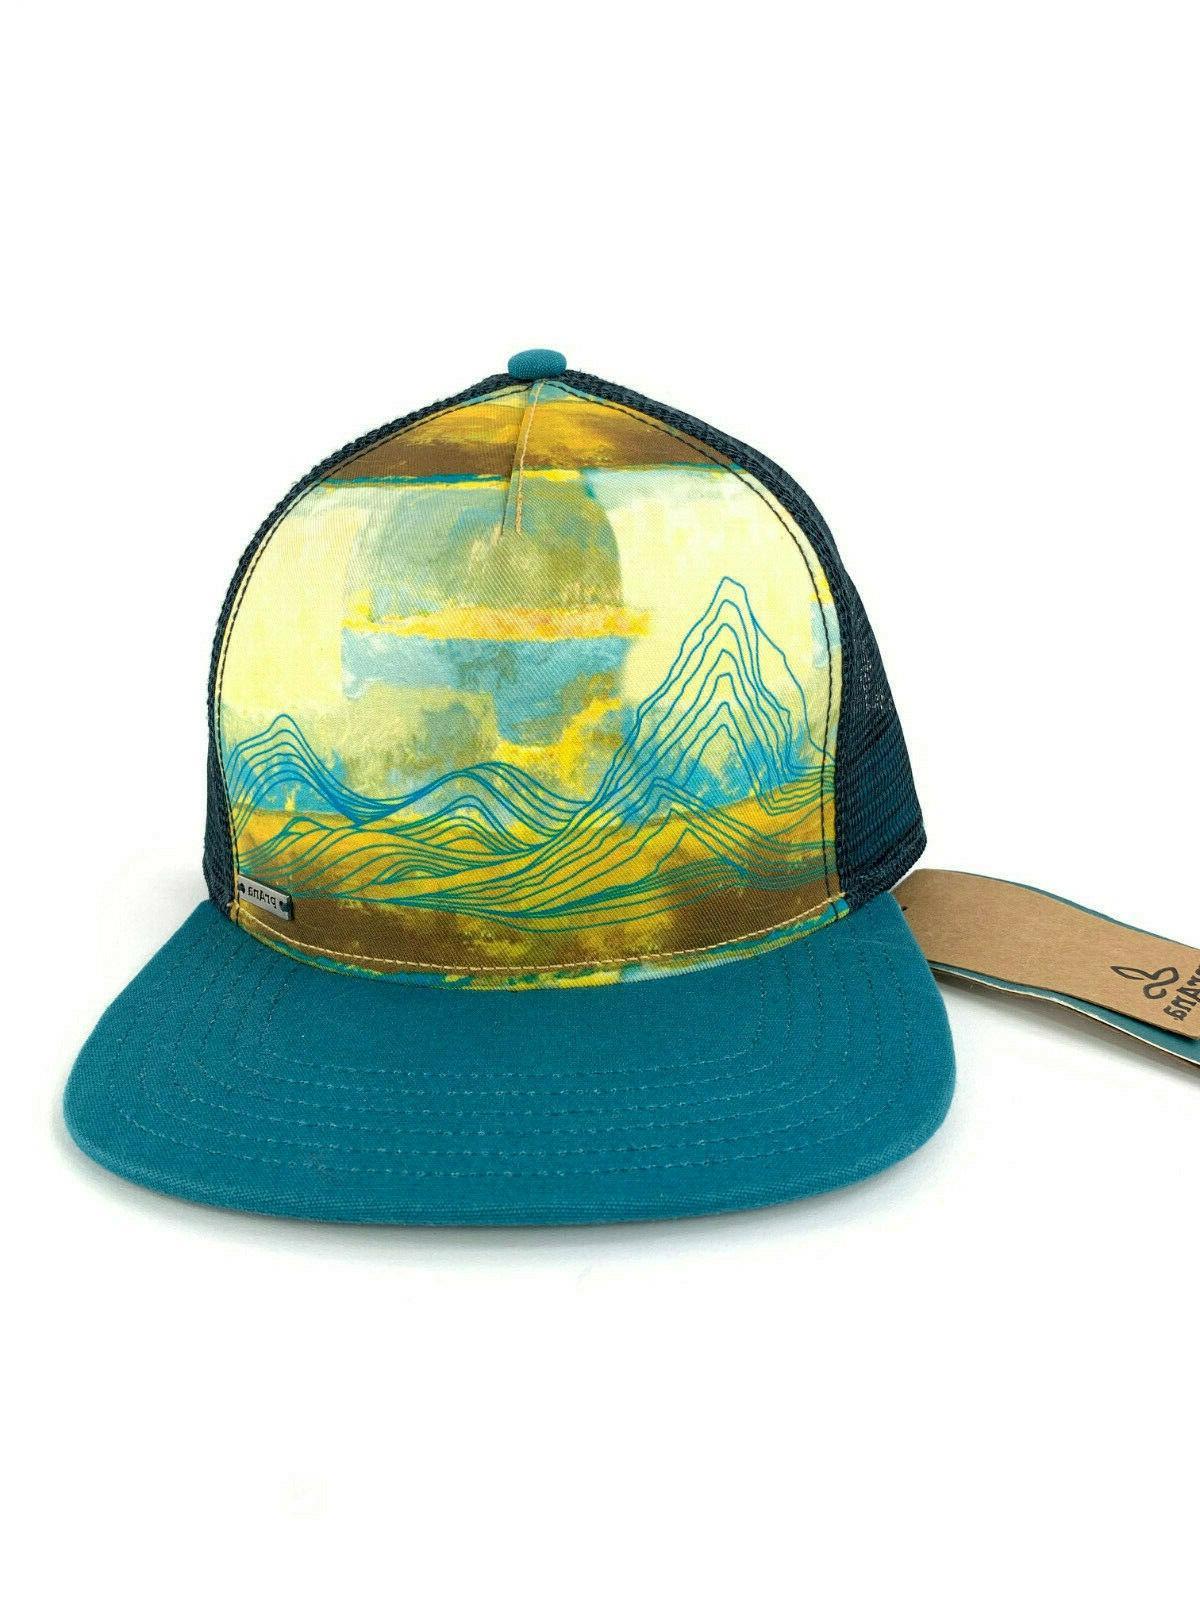 la viva trucker hat one size adjustable